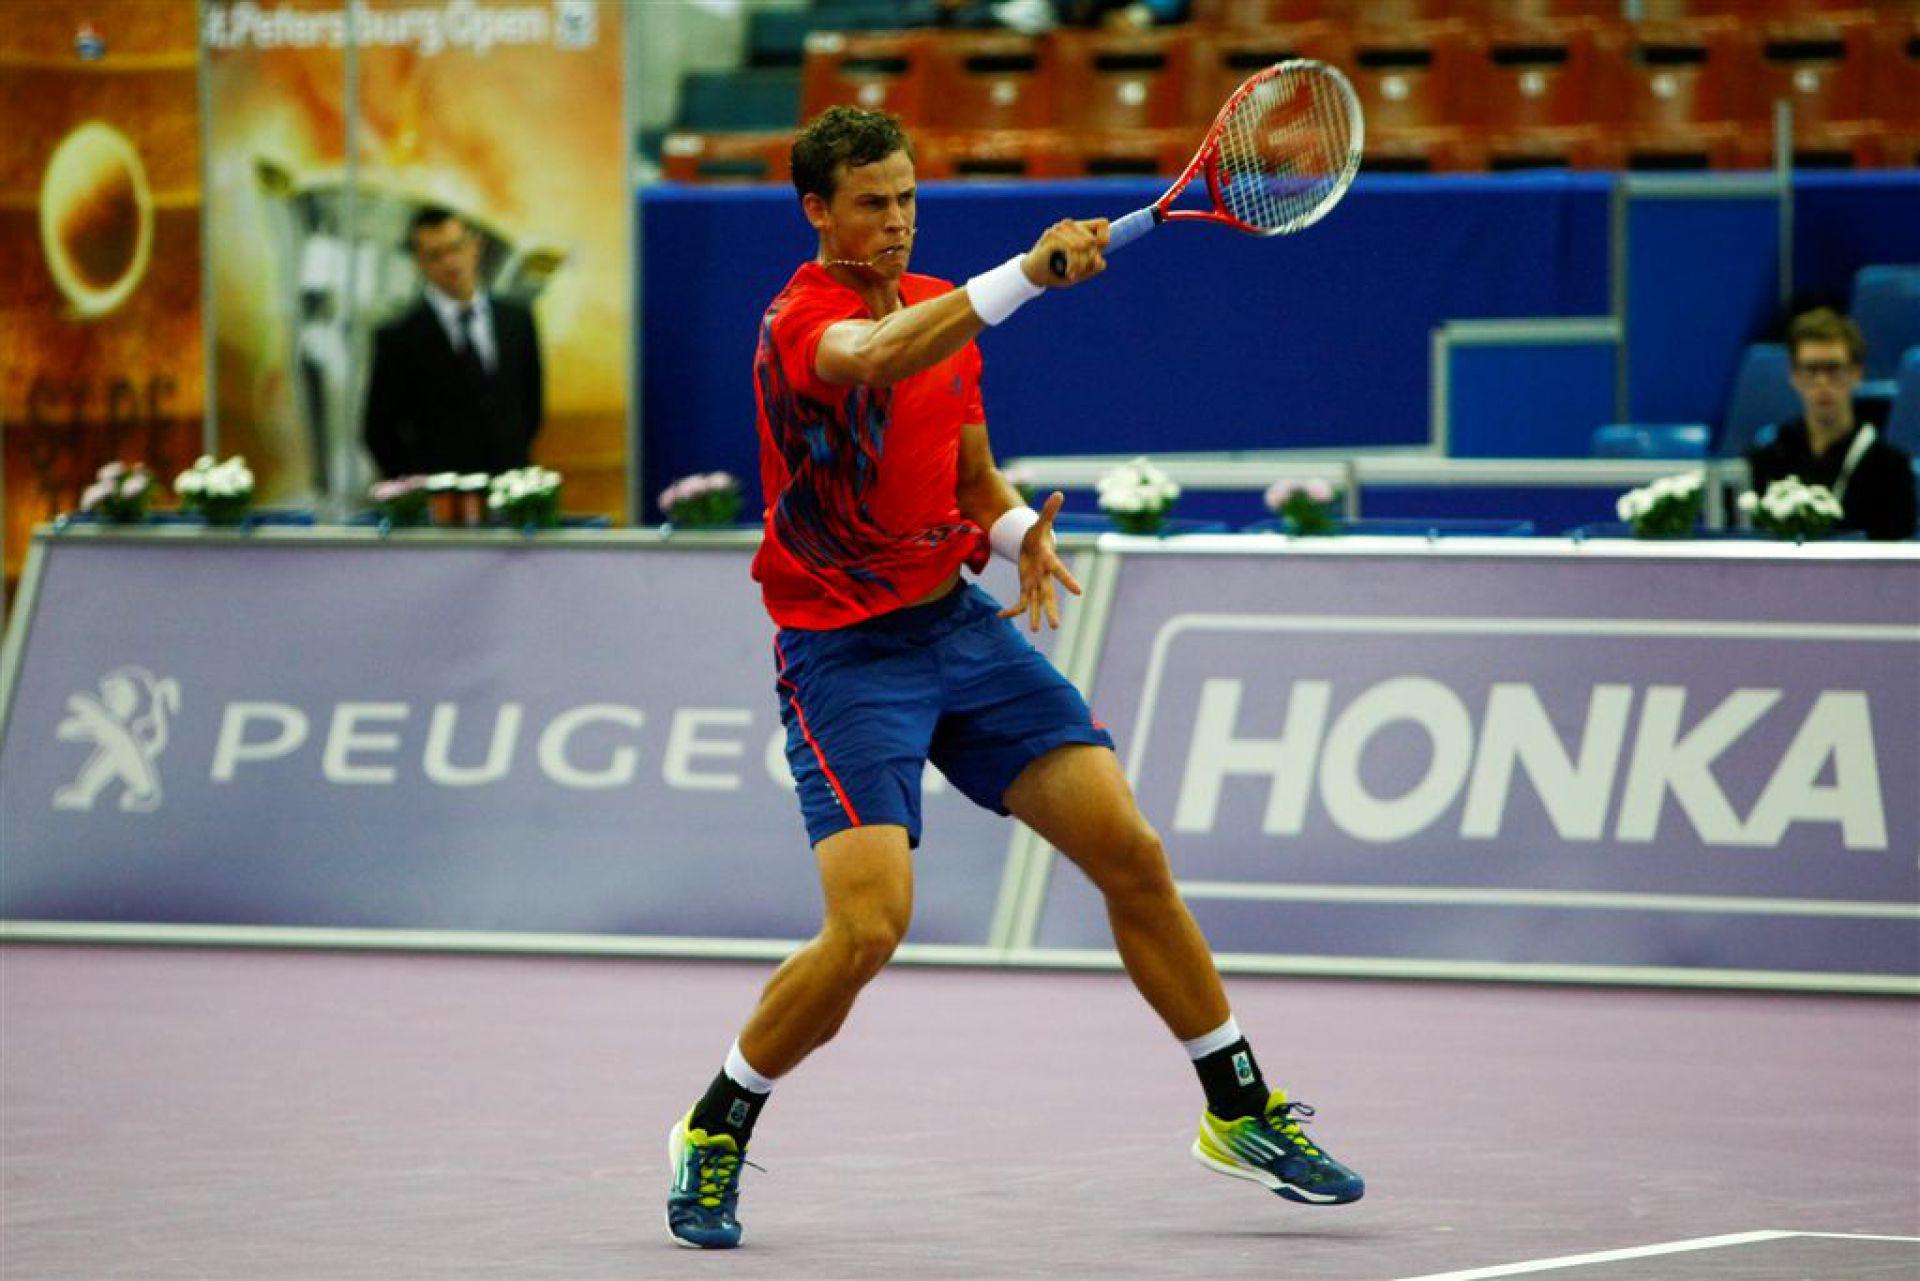 HONKA приглашает на St.Petersburg Open 2013